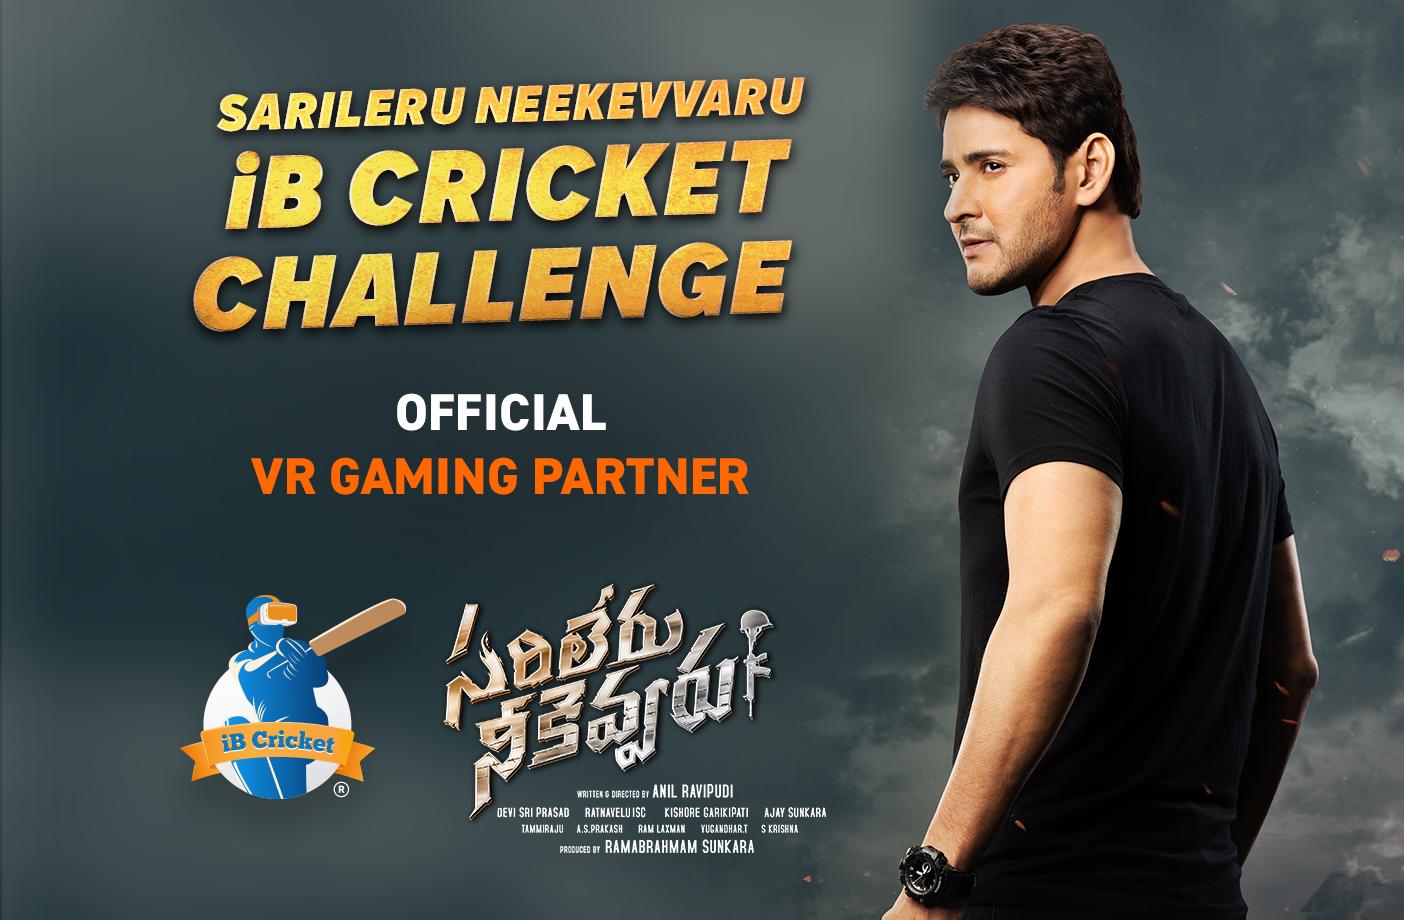 iB Cricket Sarileru Neekevvaru Challange